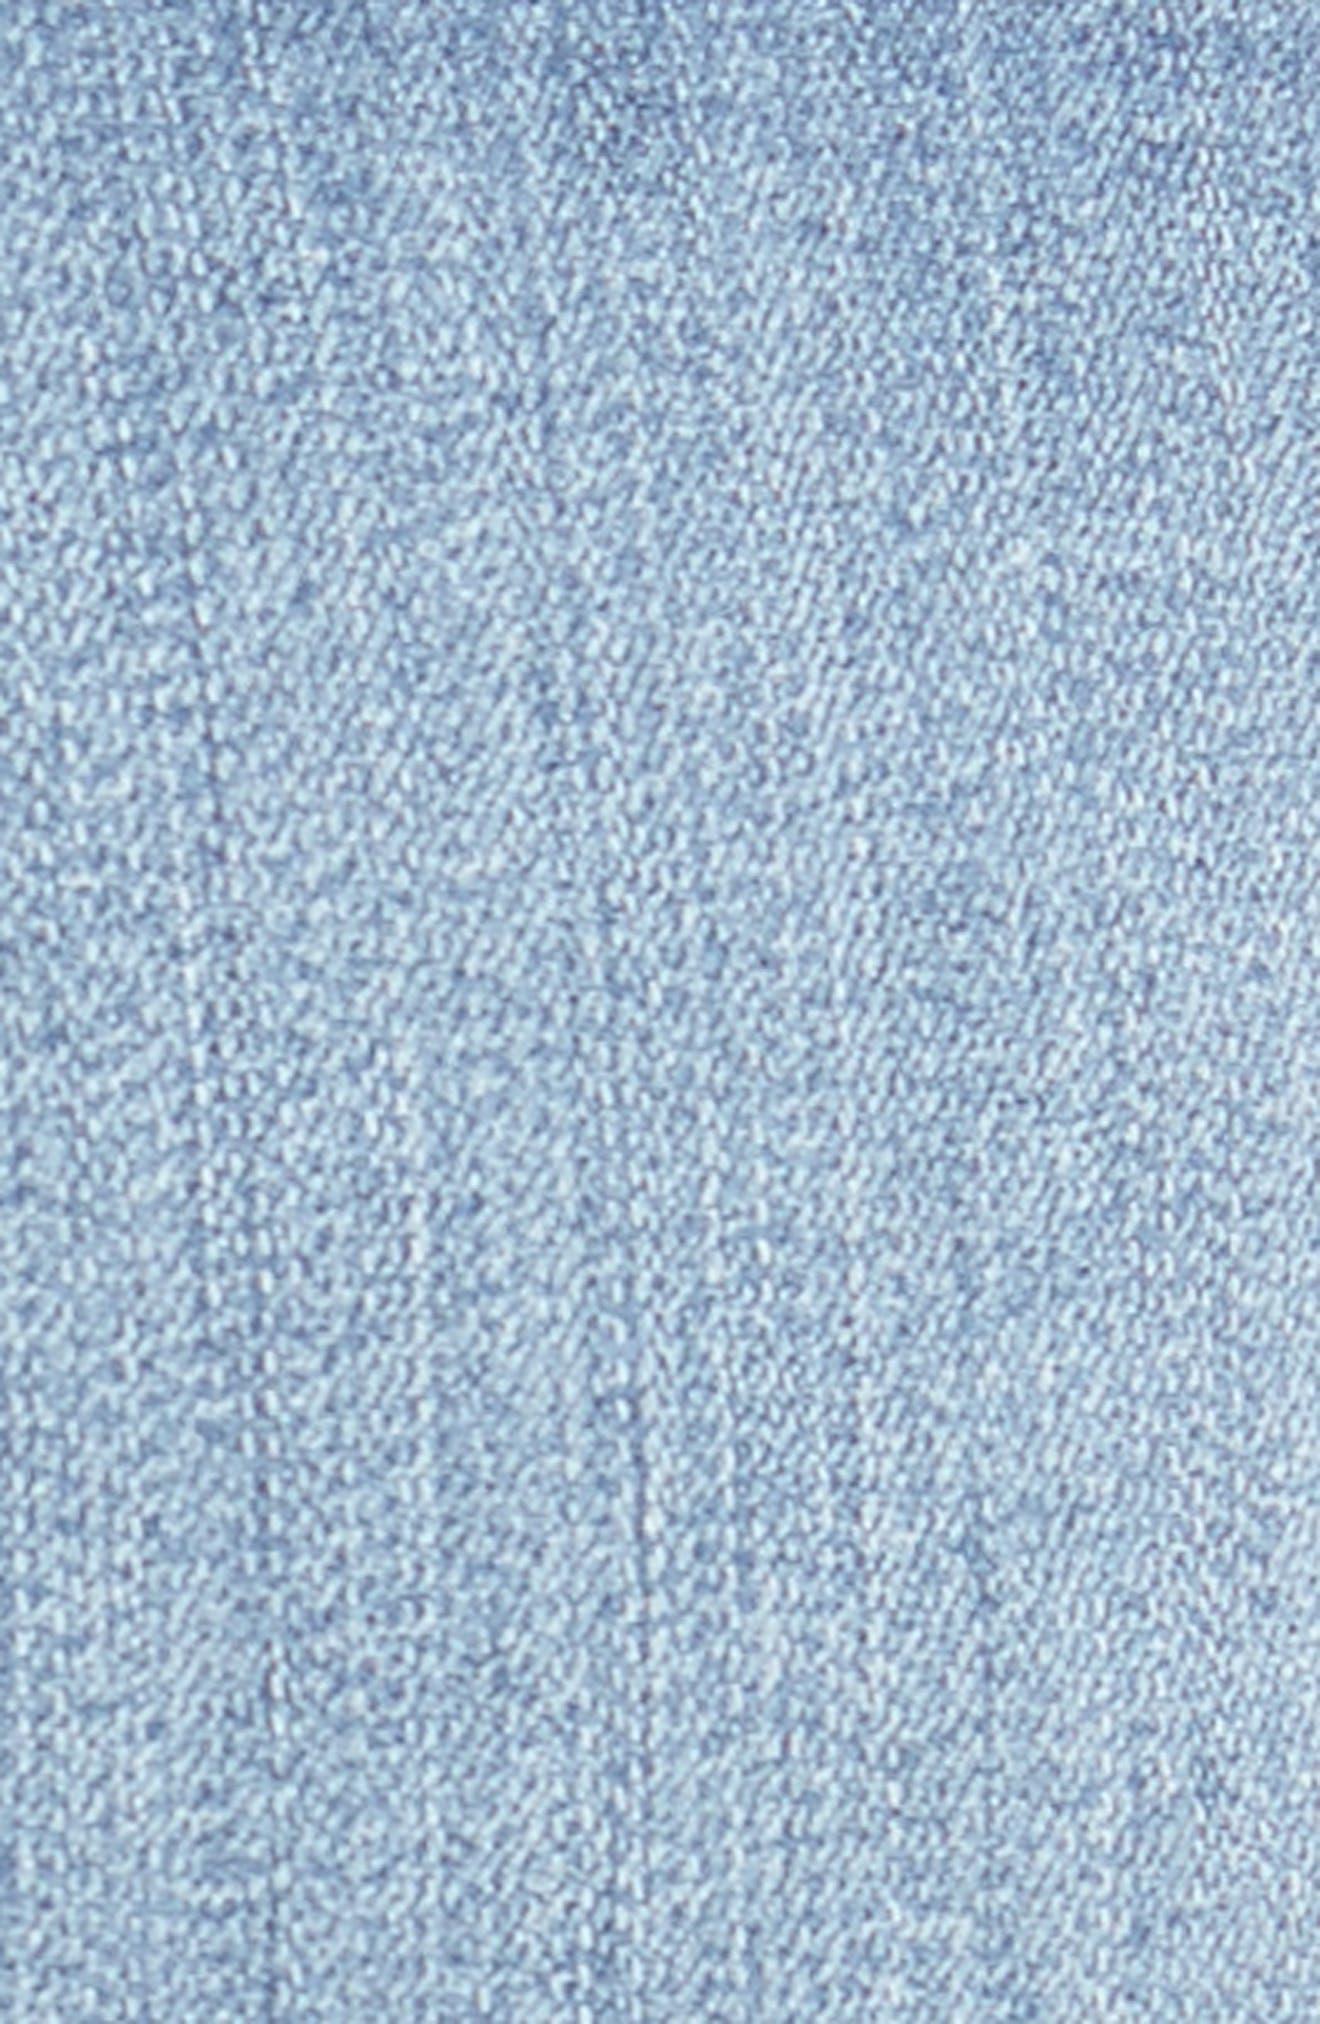 Ab-solution Cuffed Denim Shorts,                             Alternate thumbnail 5, color,                             458